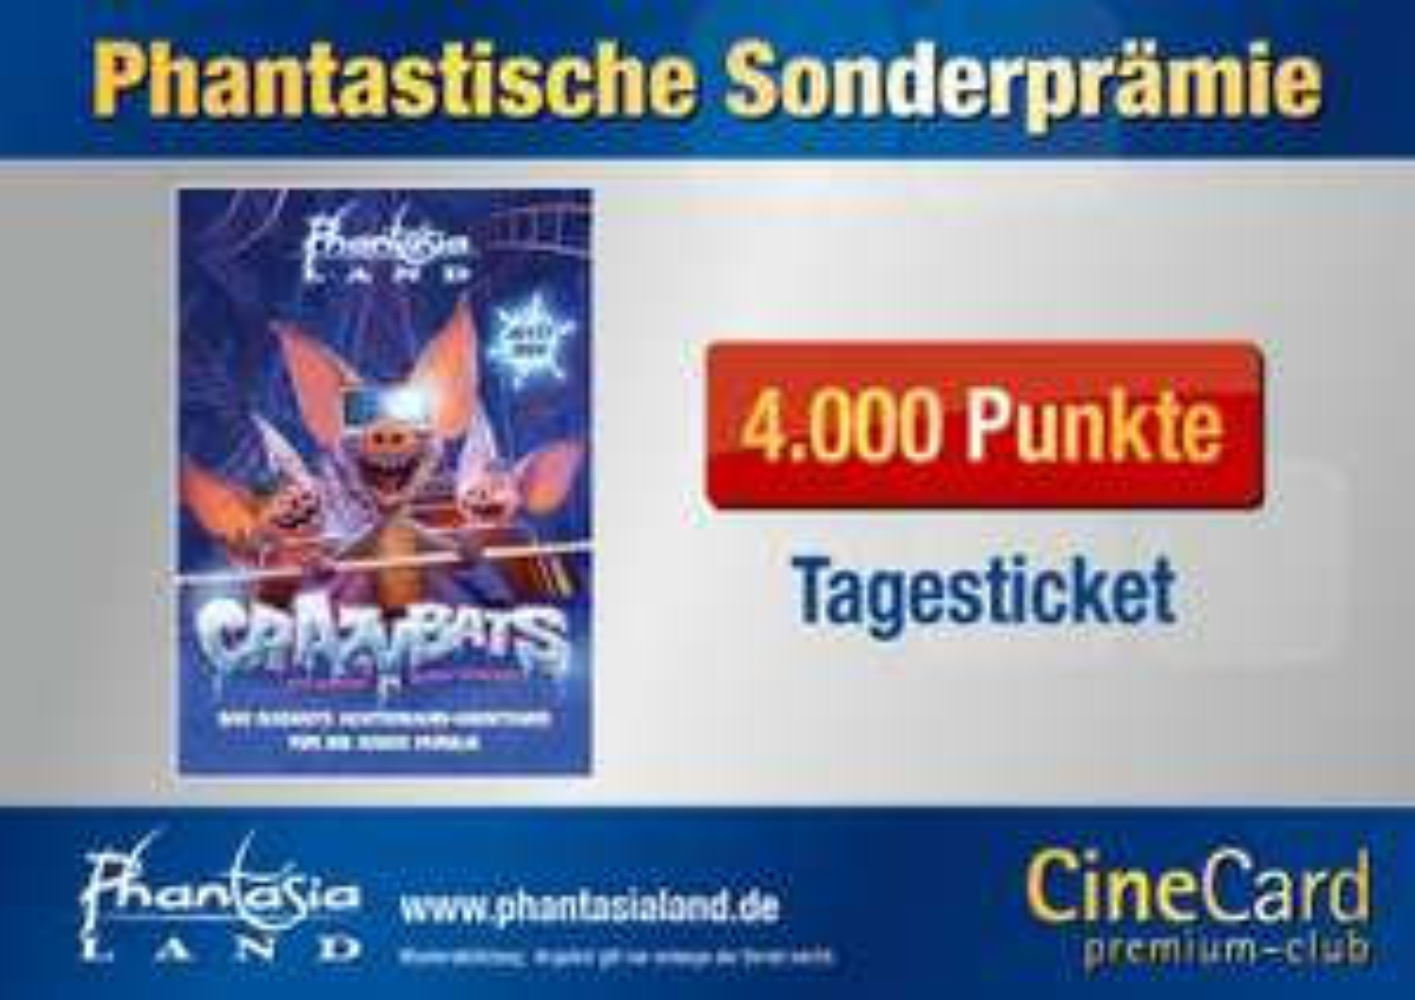 [Offline] Kinopolis: Phantasialand - Tagesticket für 4000 Cinecard-Points